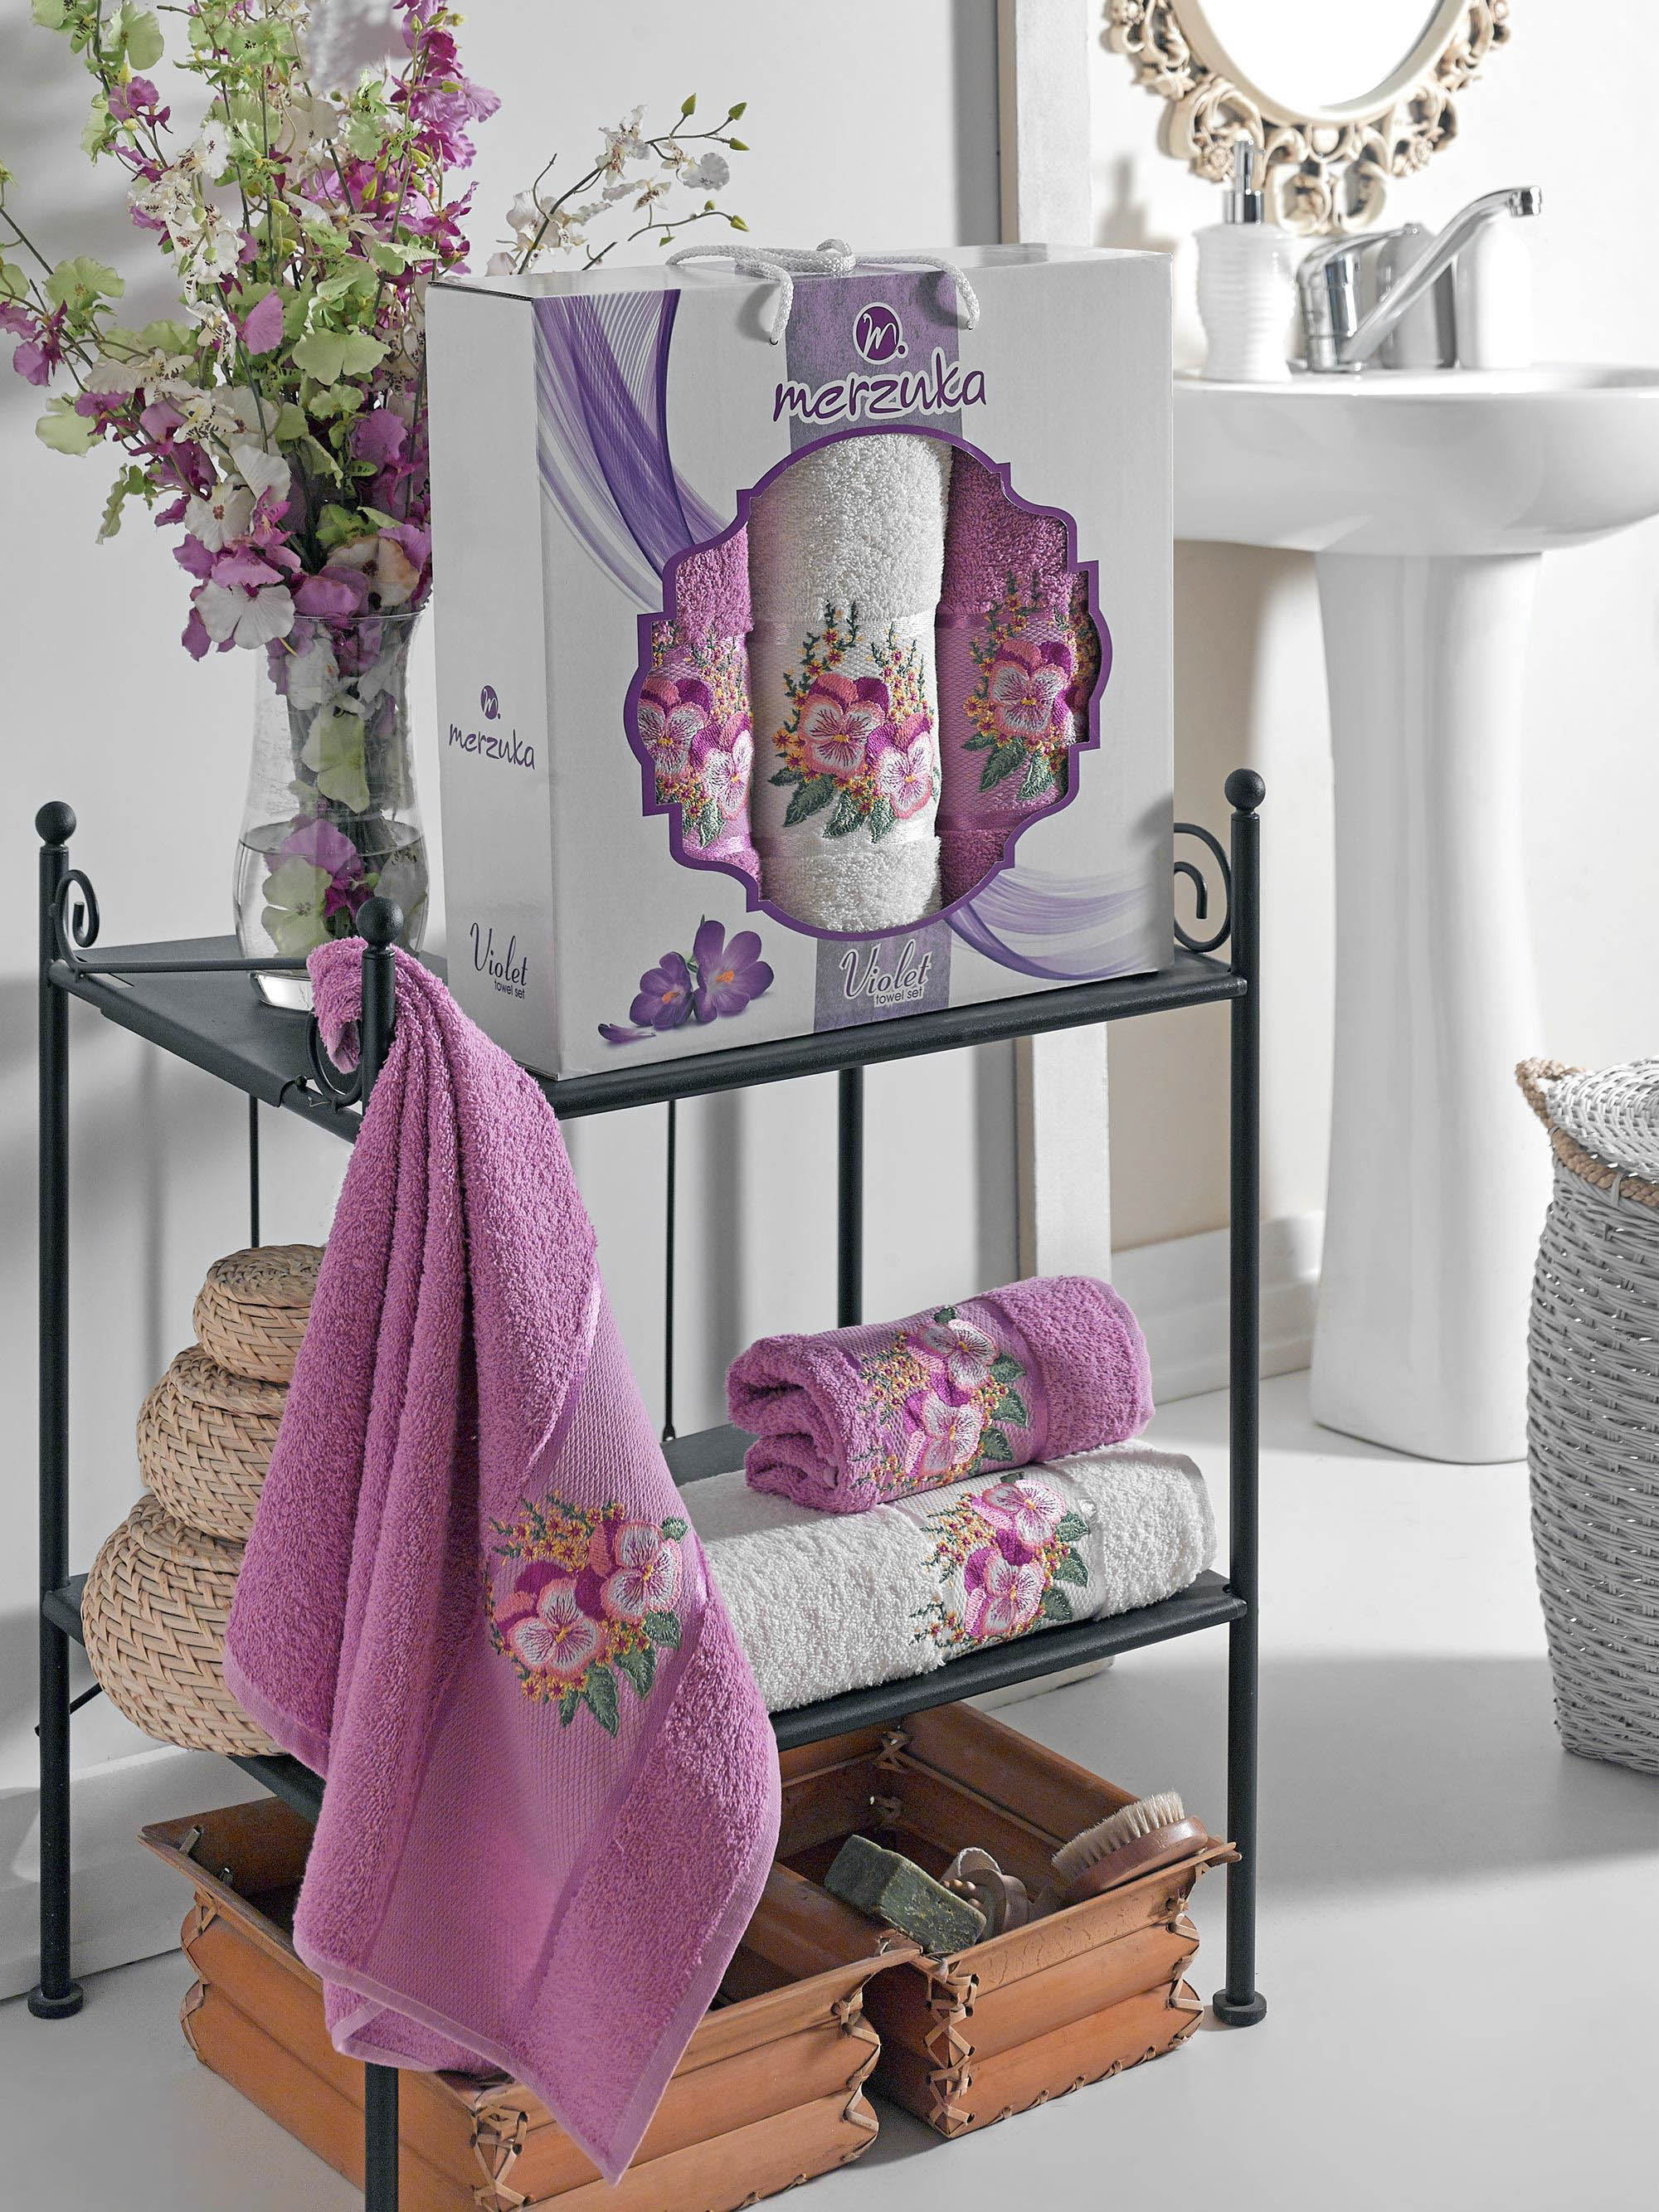 Полотенца Oran Merzuka Полотенце Violet Цвет: Светло-Лиловый (50х80 см - 2 шт,70х130 см) полотенца oran merzuka полотенце sakura цвет светло лиловый набор